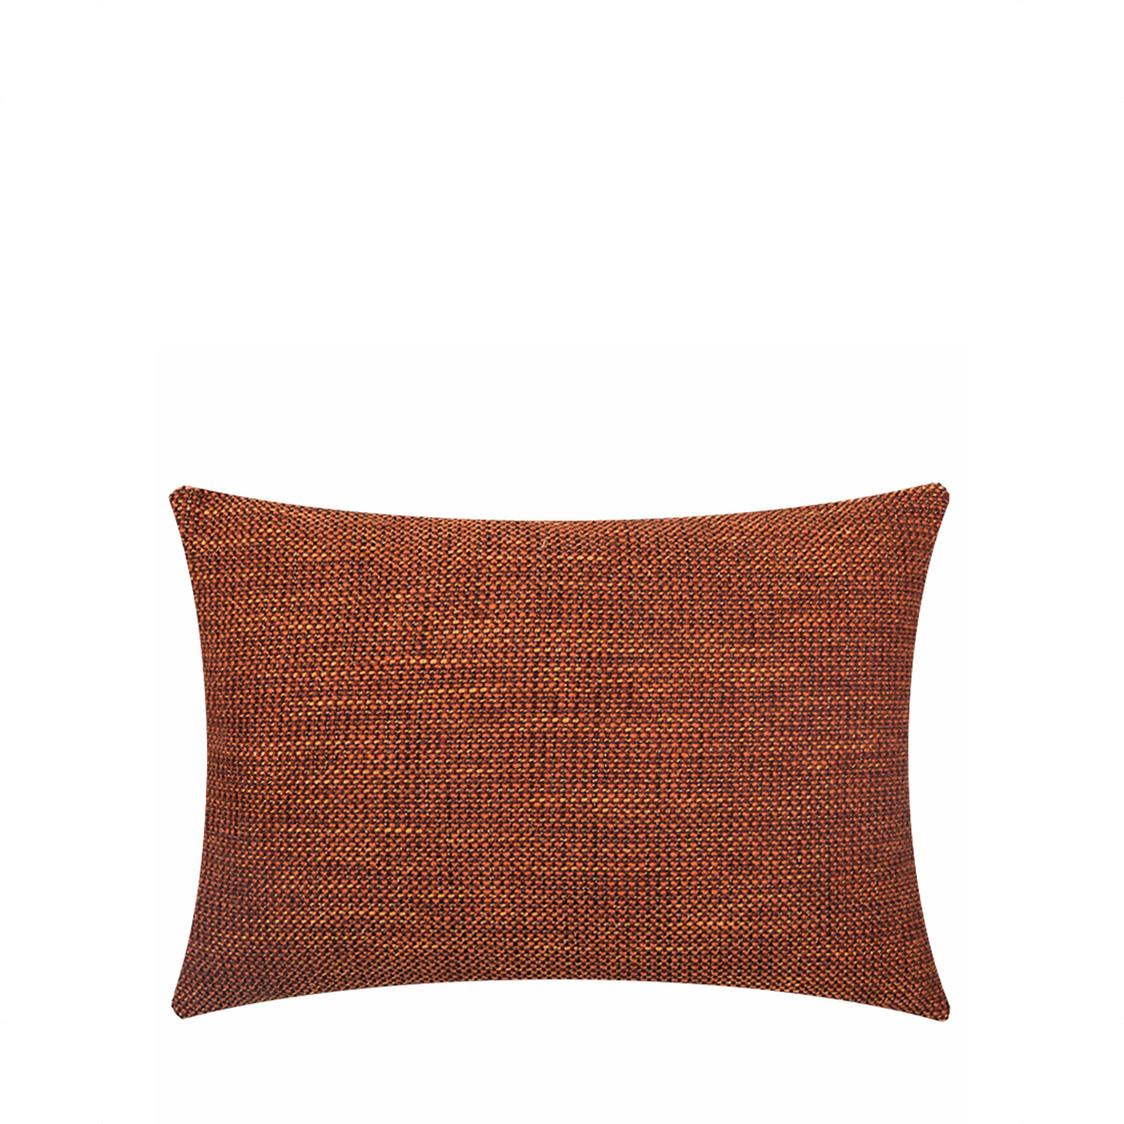 JRapee Lindie Oblong Cushion Orange 33x48cm